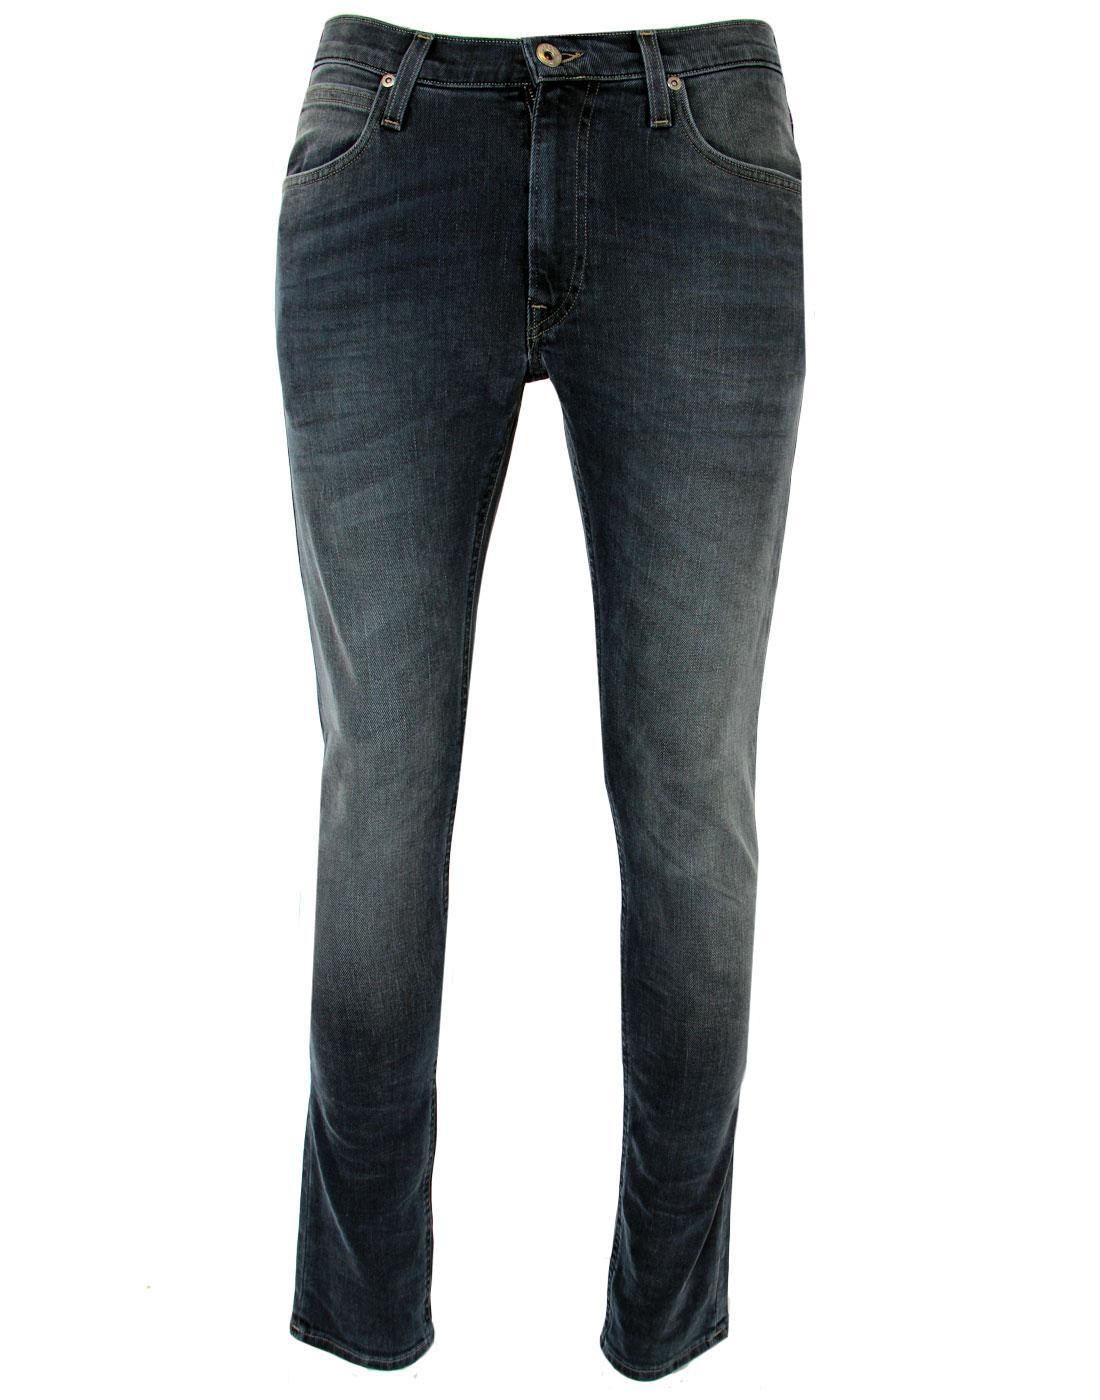 Luke LEE Jeans Retro Slim Tapered Indie Jeans CB